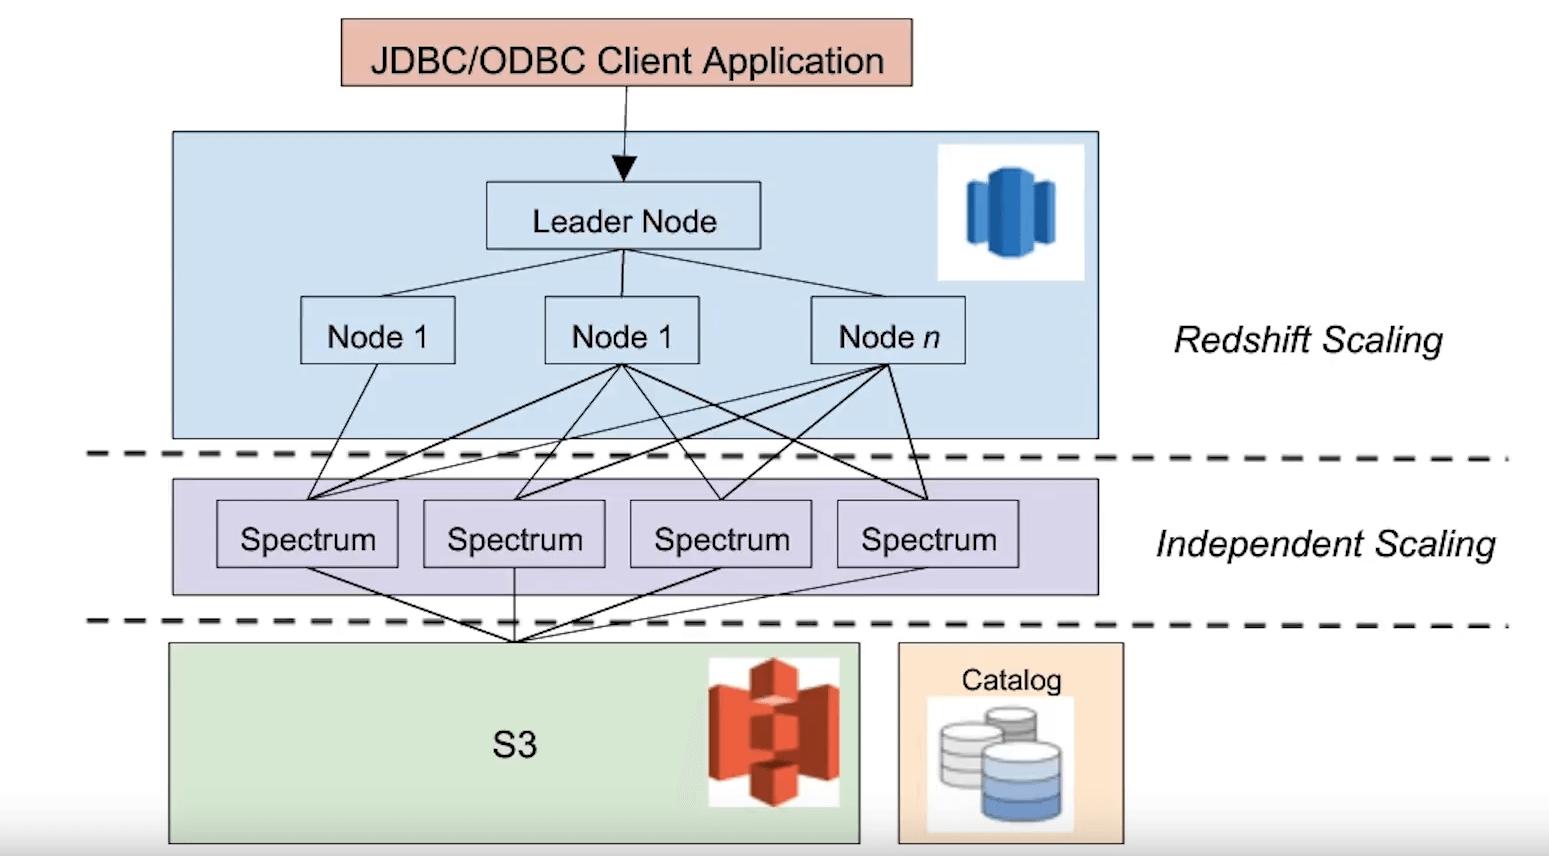 Amazon-Redshift-Spectrum-Matillion-Data lakes - Architecture